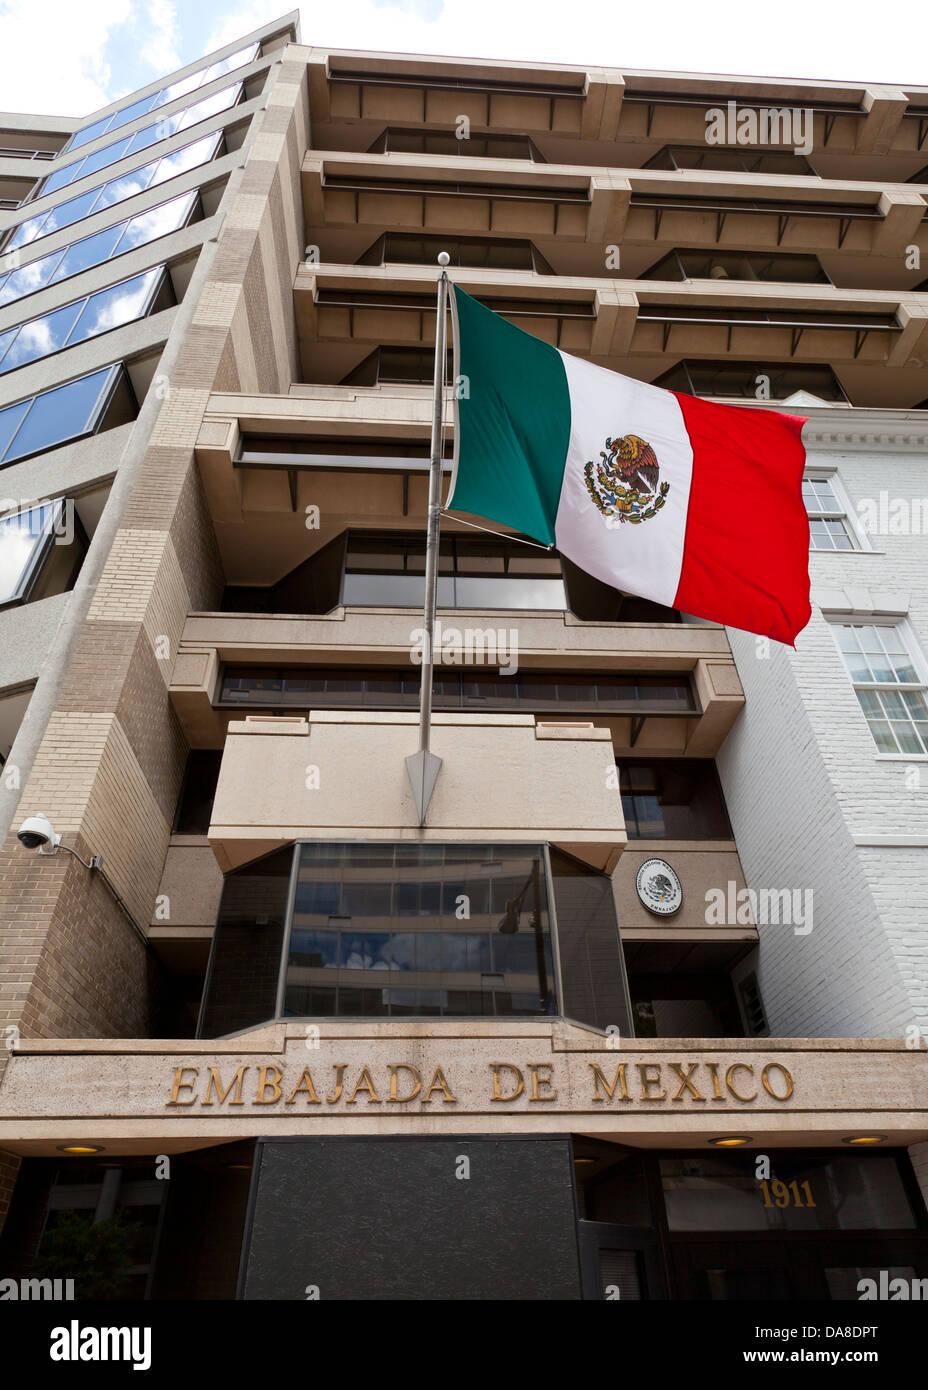 Embassy of Mexico  - Washington, DC USA - Stock Image